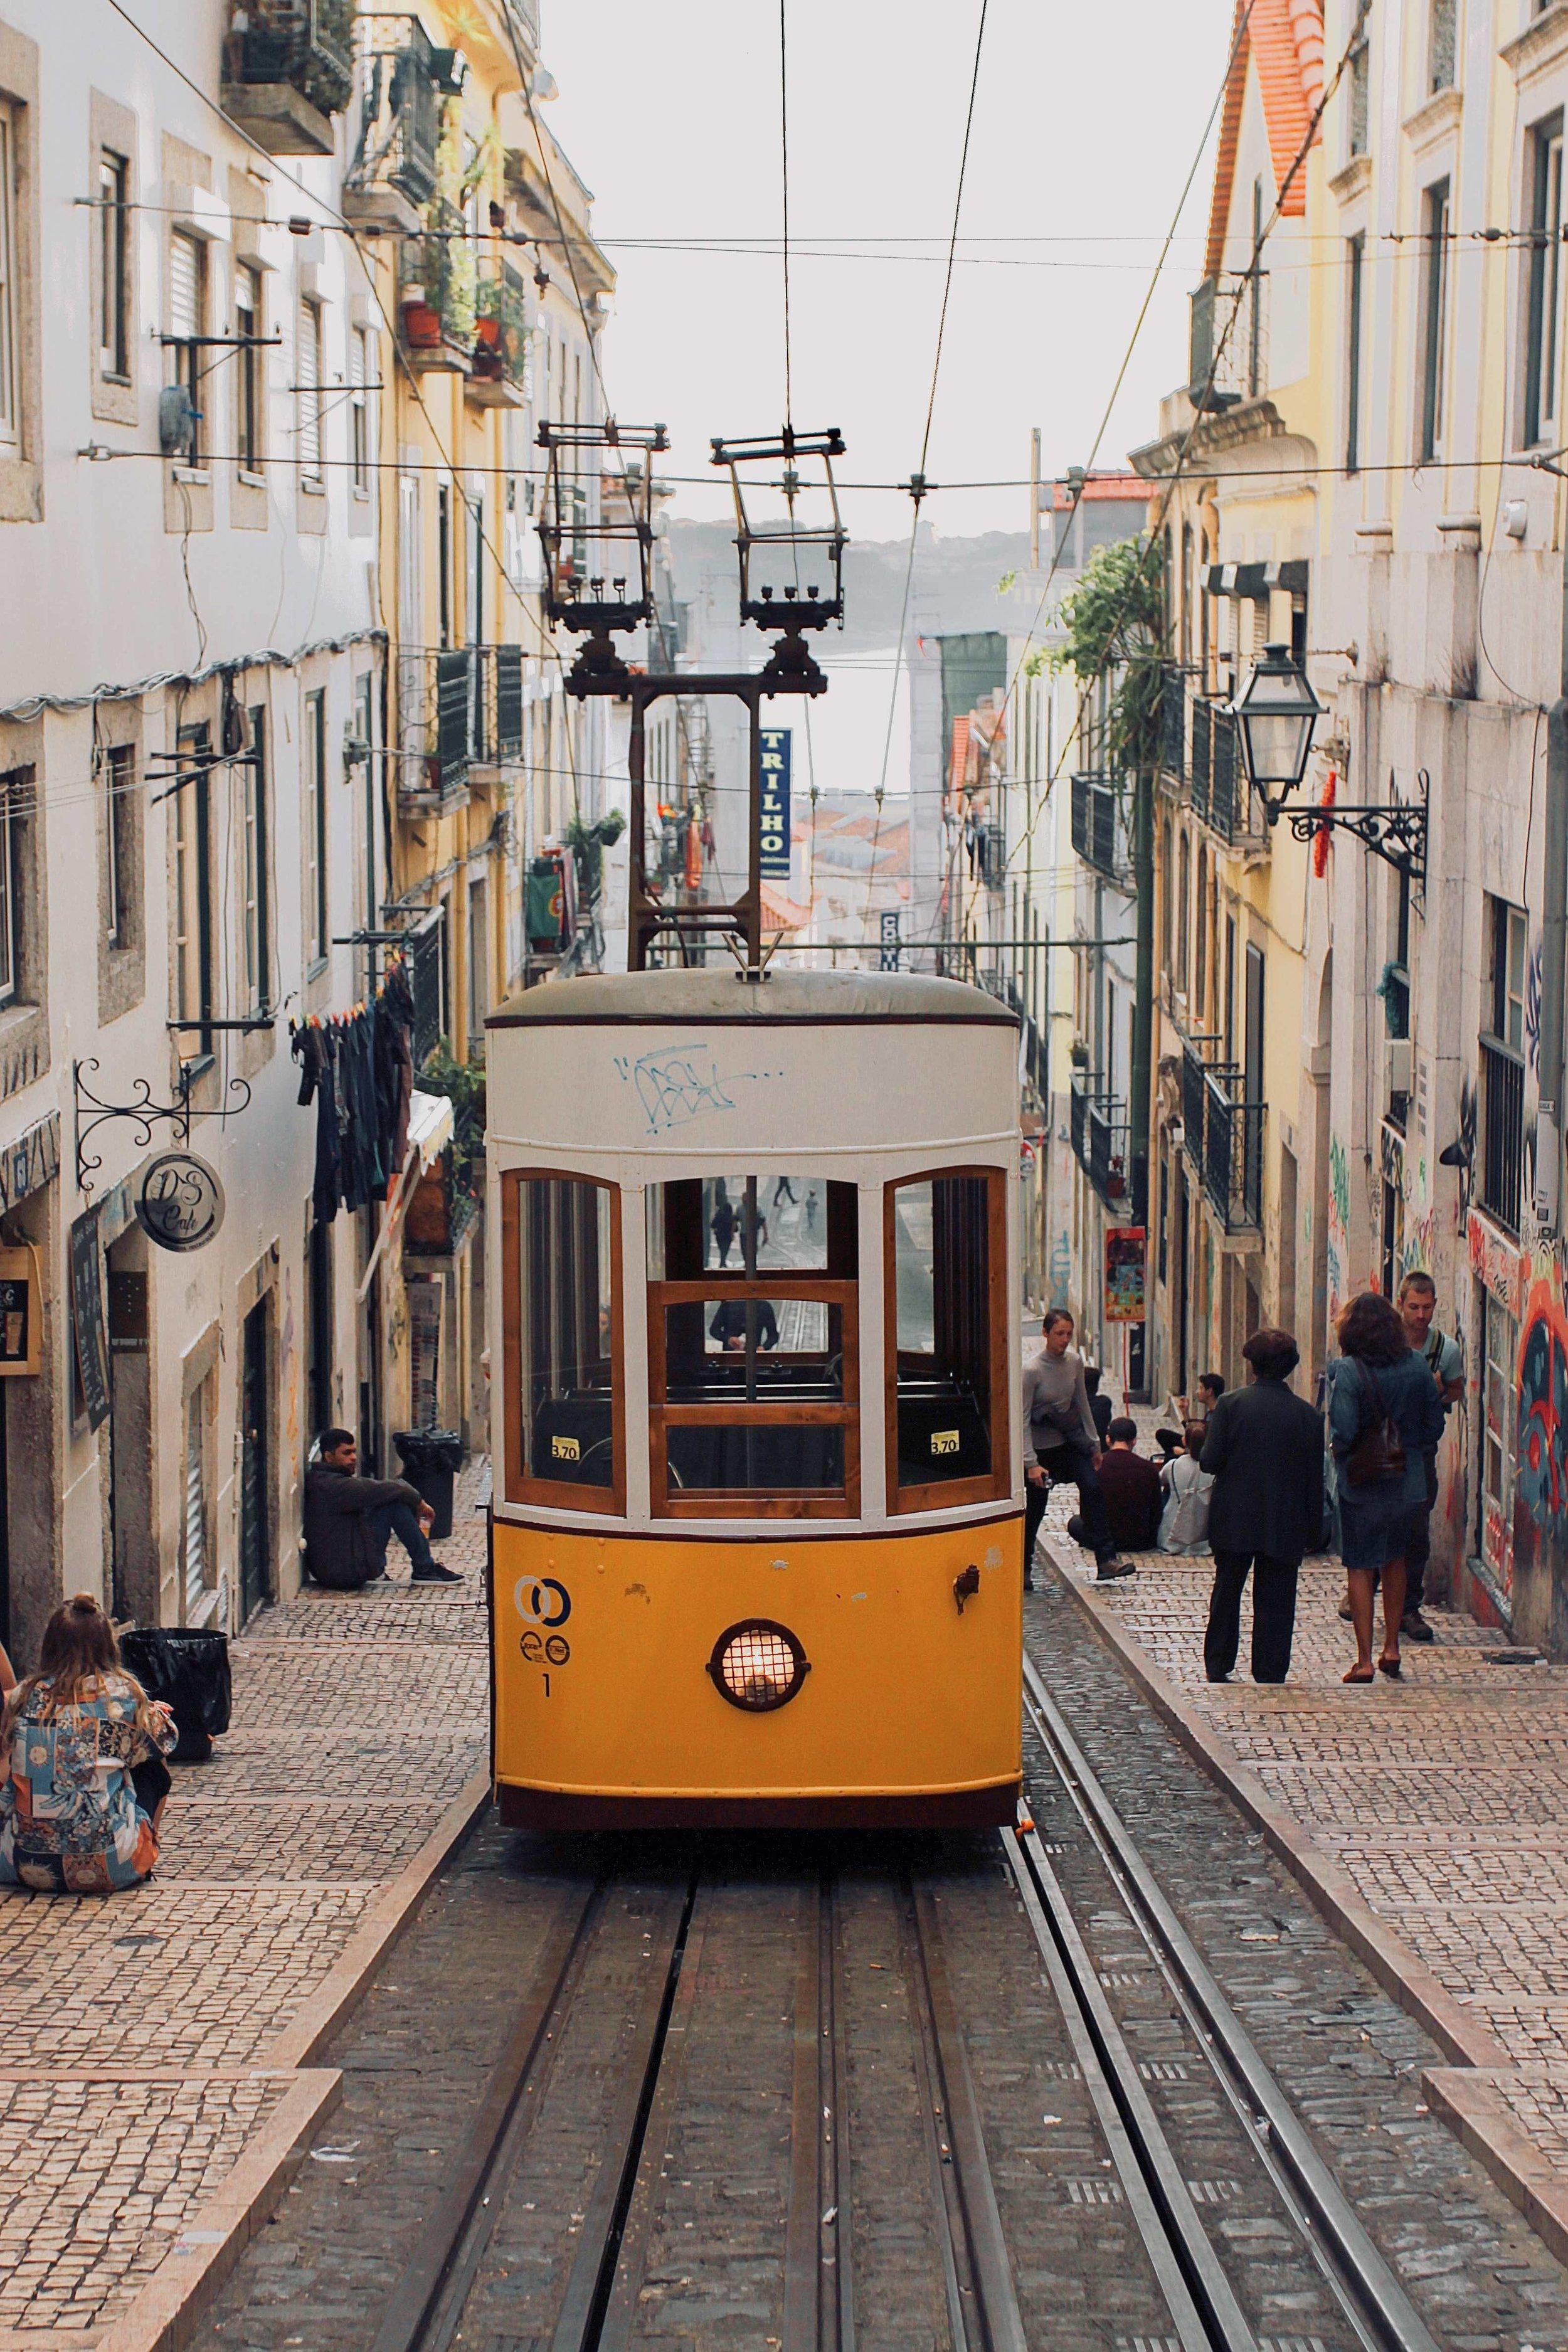 Unique experiences over 2 days in Lisbon